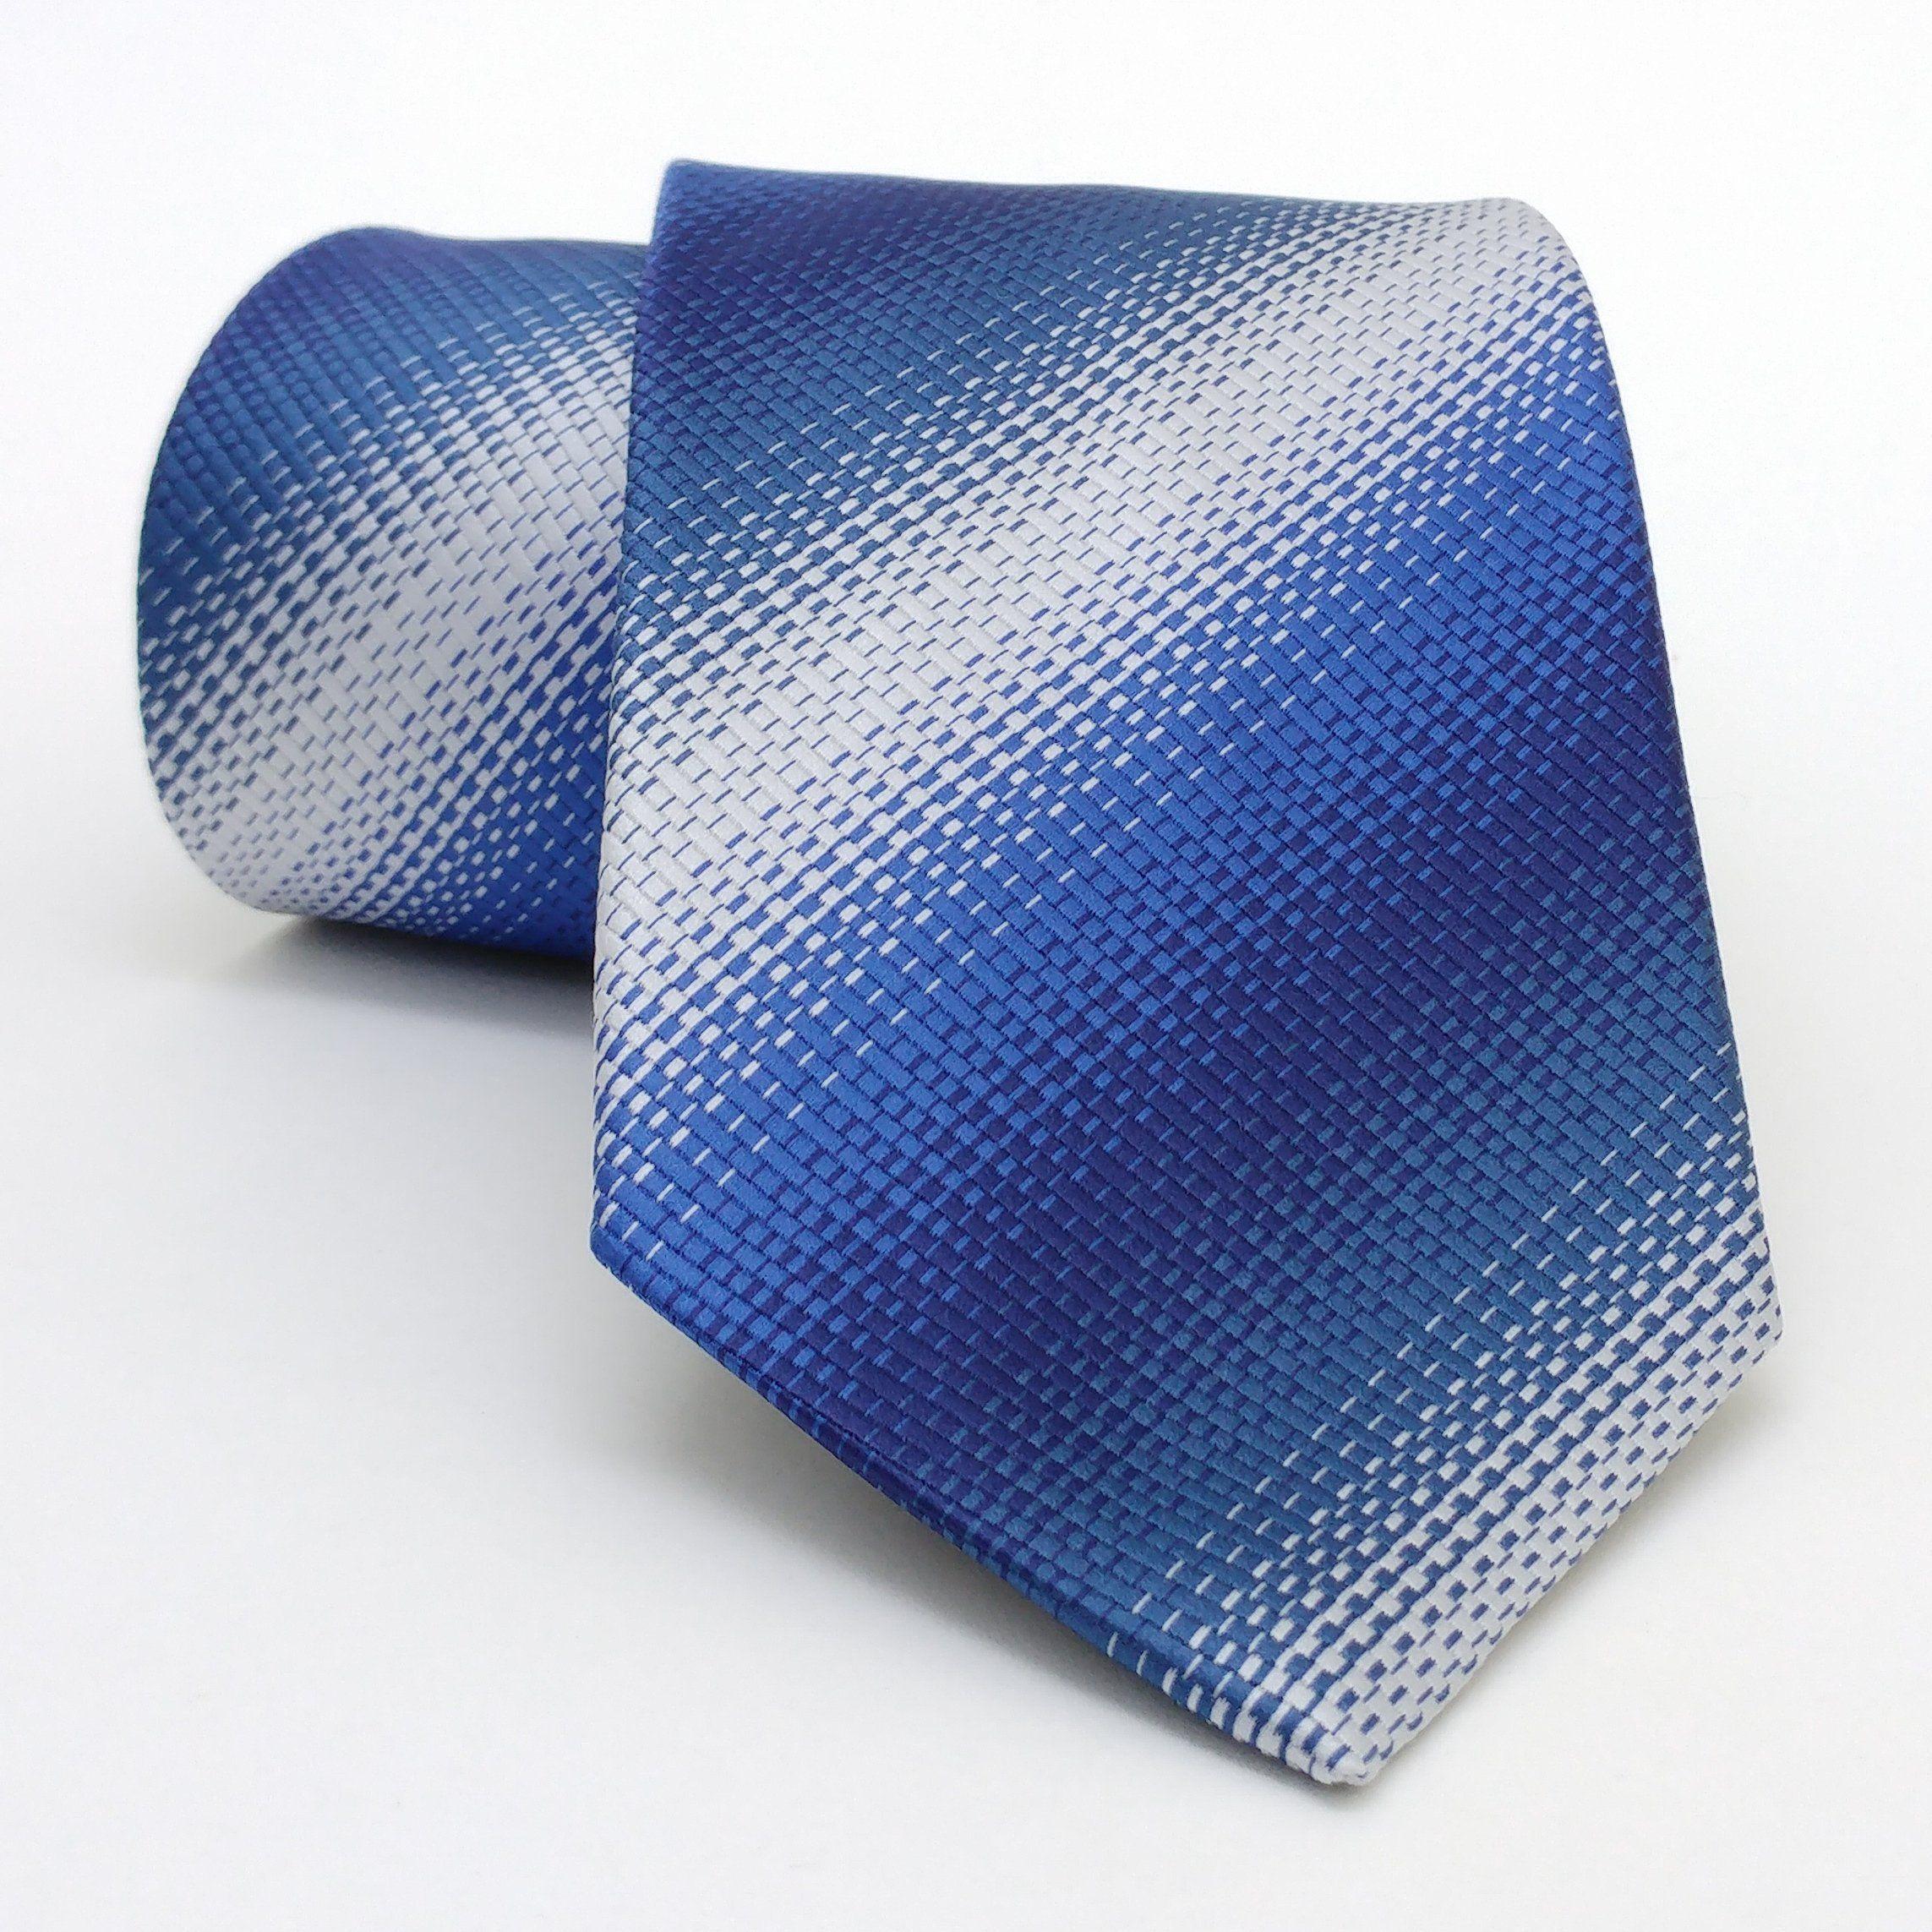 "Dark blue, sax blue, grey dotted men's tie 8 cm (3,15"") DK-532. Dark blue, sax blue, grey dotted men's necktie DK-532 Width : 8 cm (3,15"") Length : 150 cm (59,06"")."